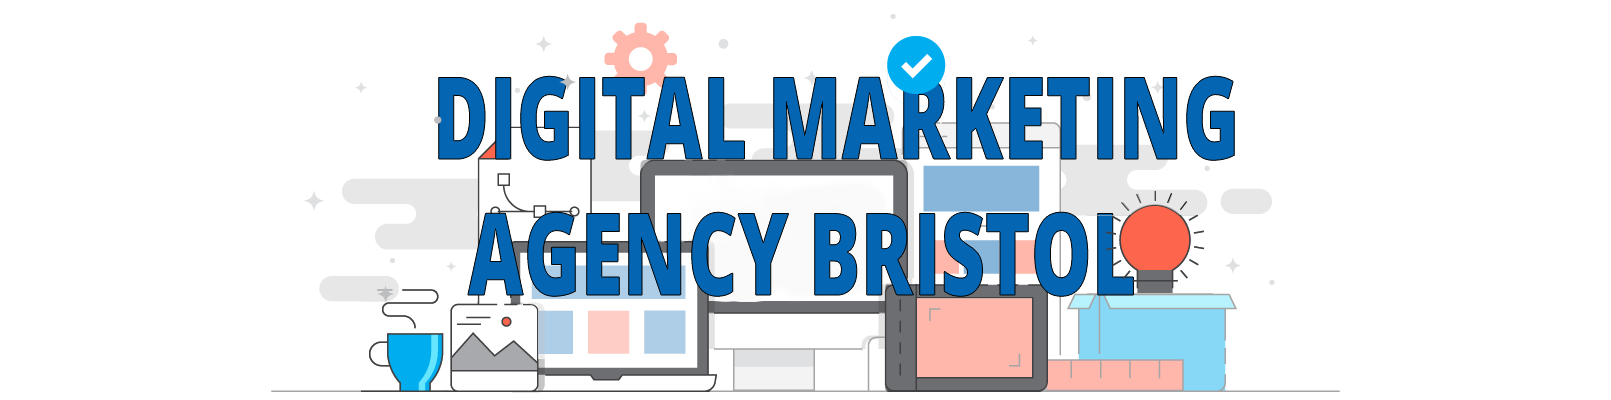 seek social digital marketing agency bristol header with transparent background